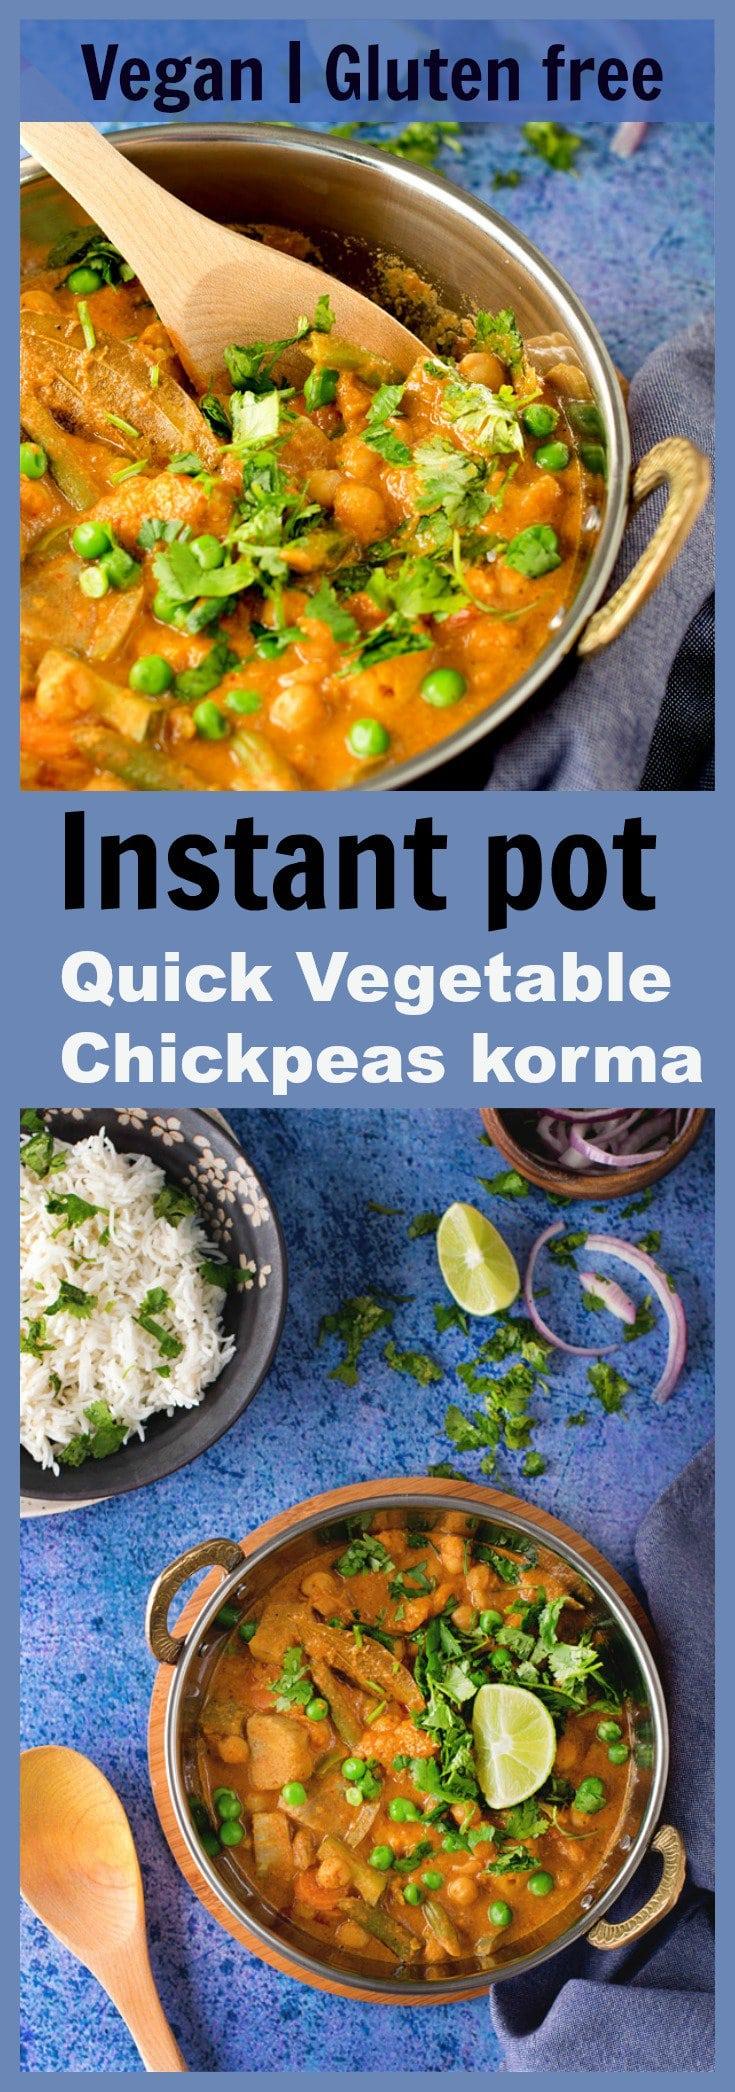 vegetable chickpeas curry korma vegan